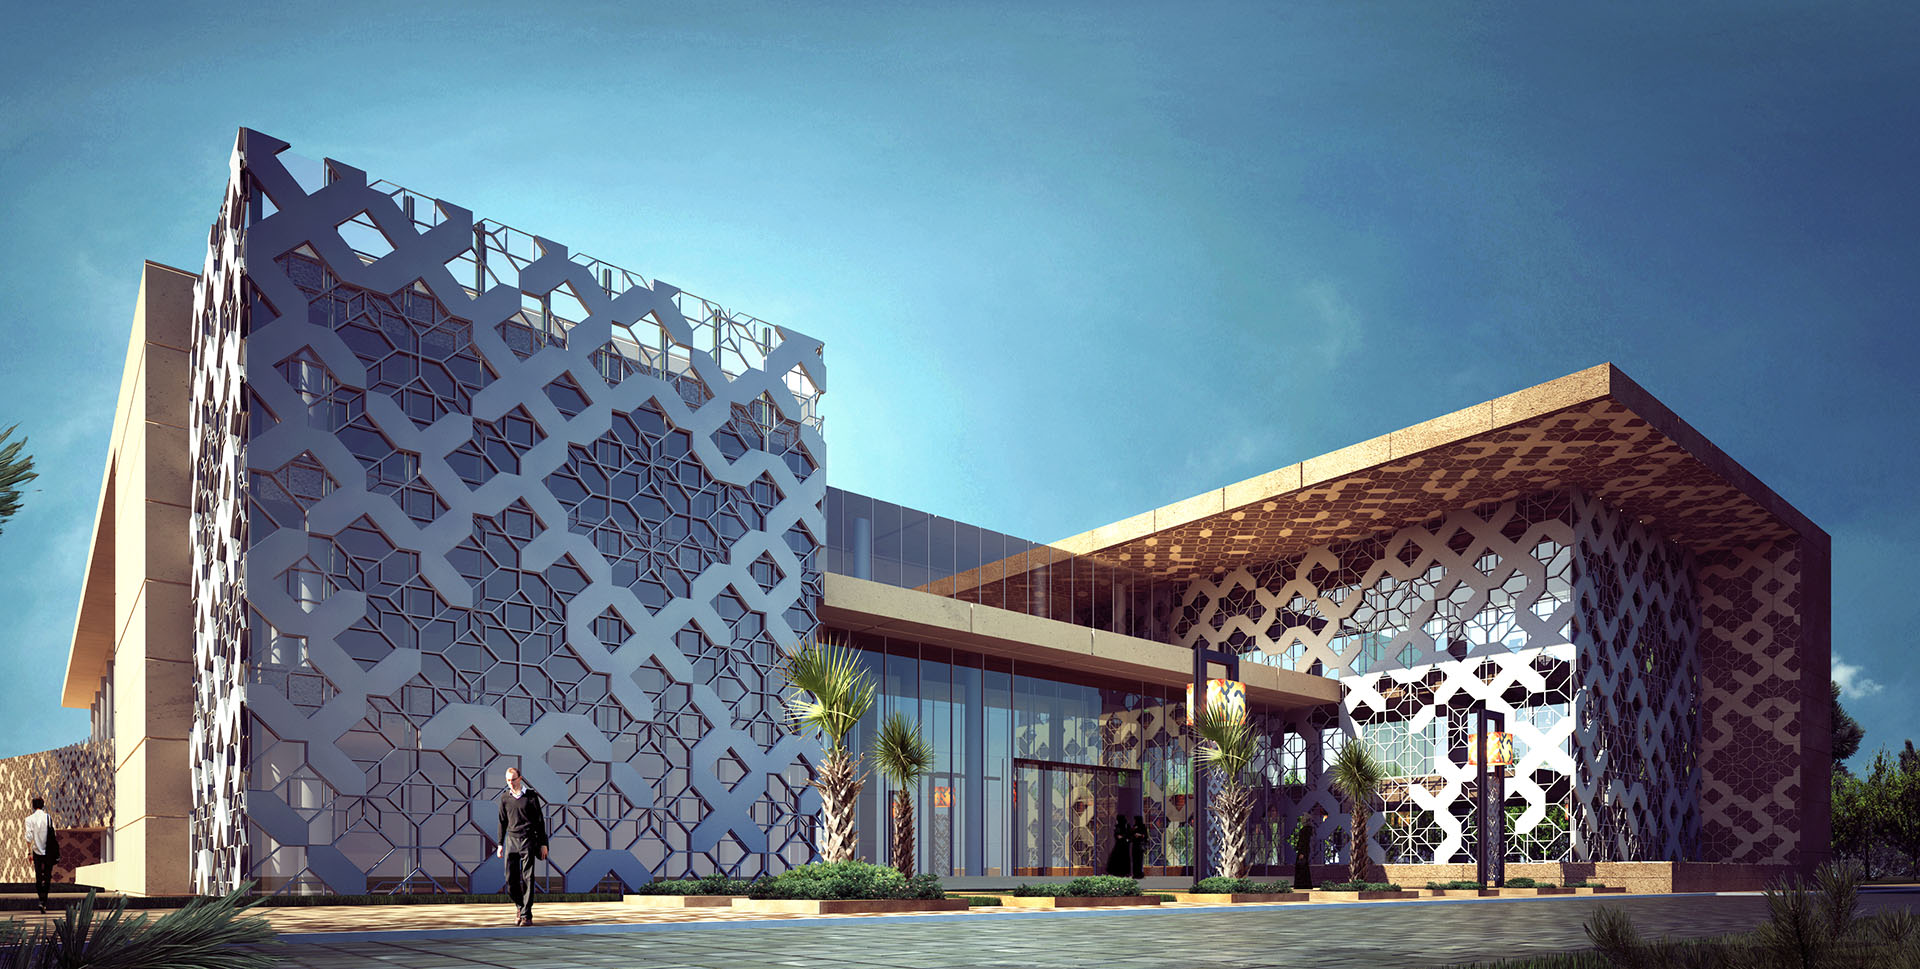 College of Pharmacy at Qatar University